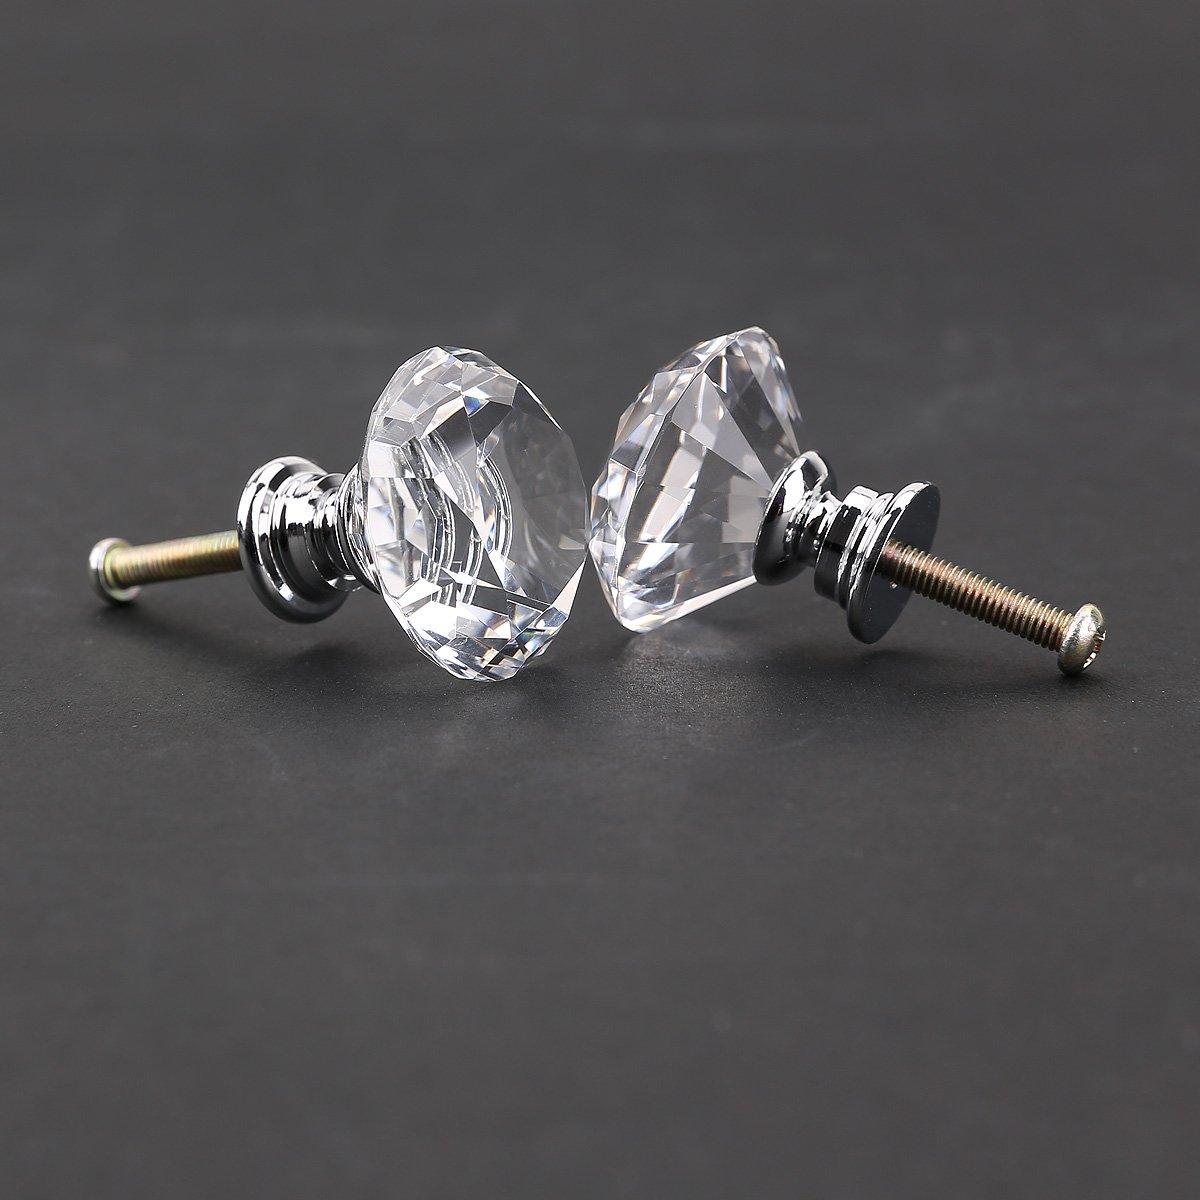 8pcs Pomo de Cristal Vidrio Transparente Tiradores para Puertas Cajones Manilla 4mm de Diamante